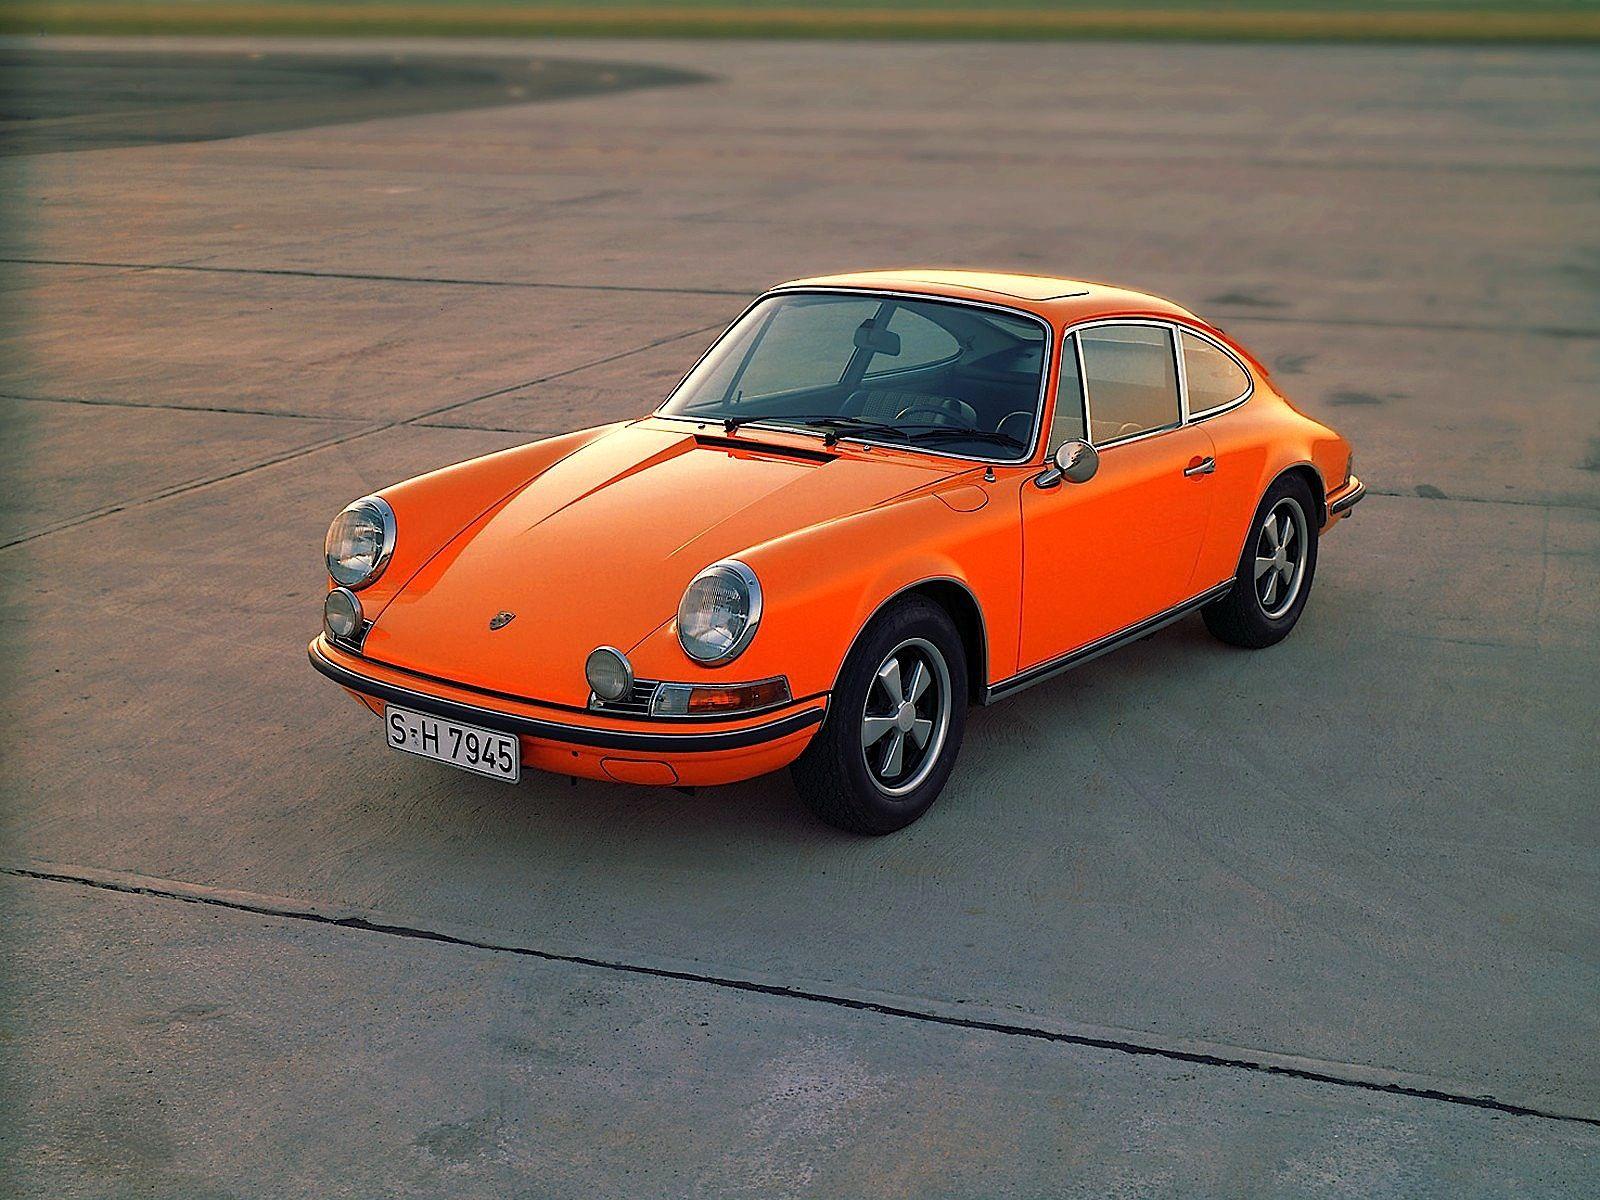 All sizes | 1970 Porsche 911 S 2.2 Coupé | Flickr - Photo Sharing!